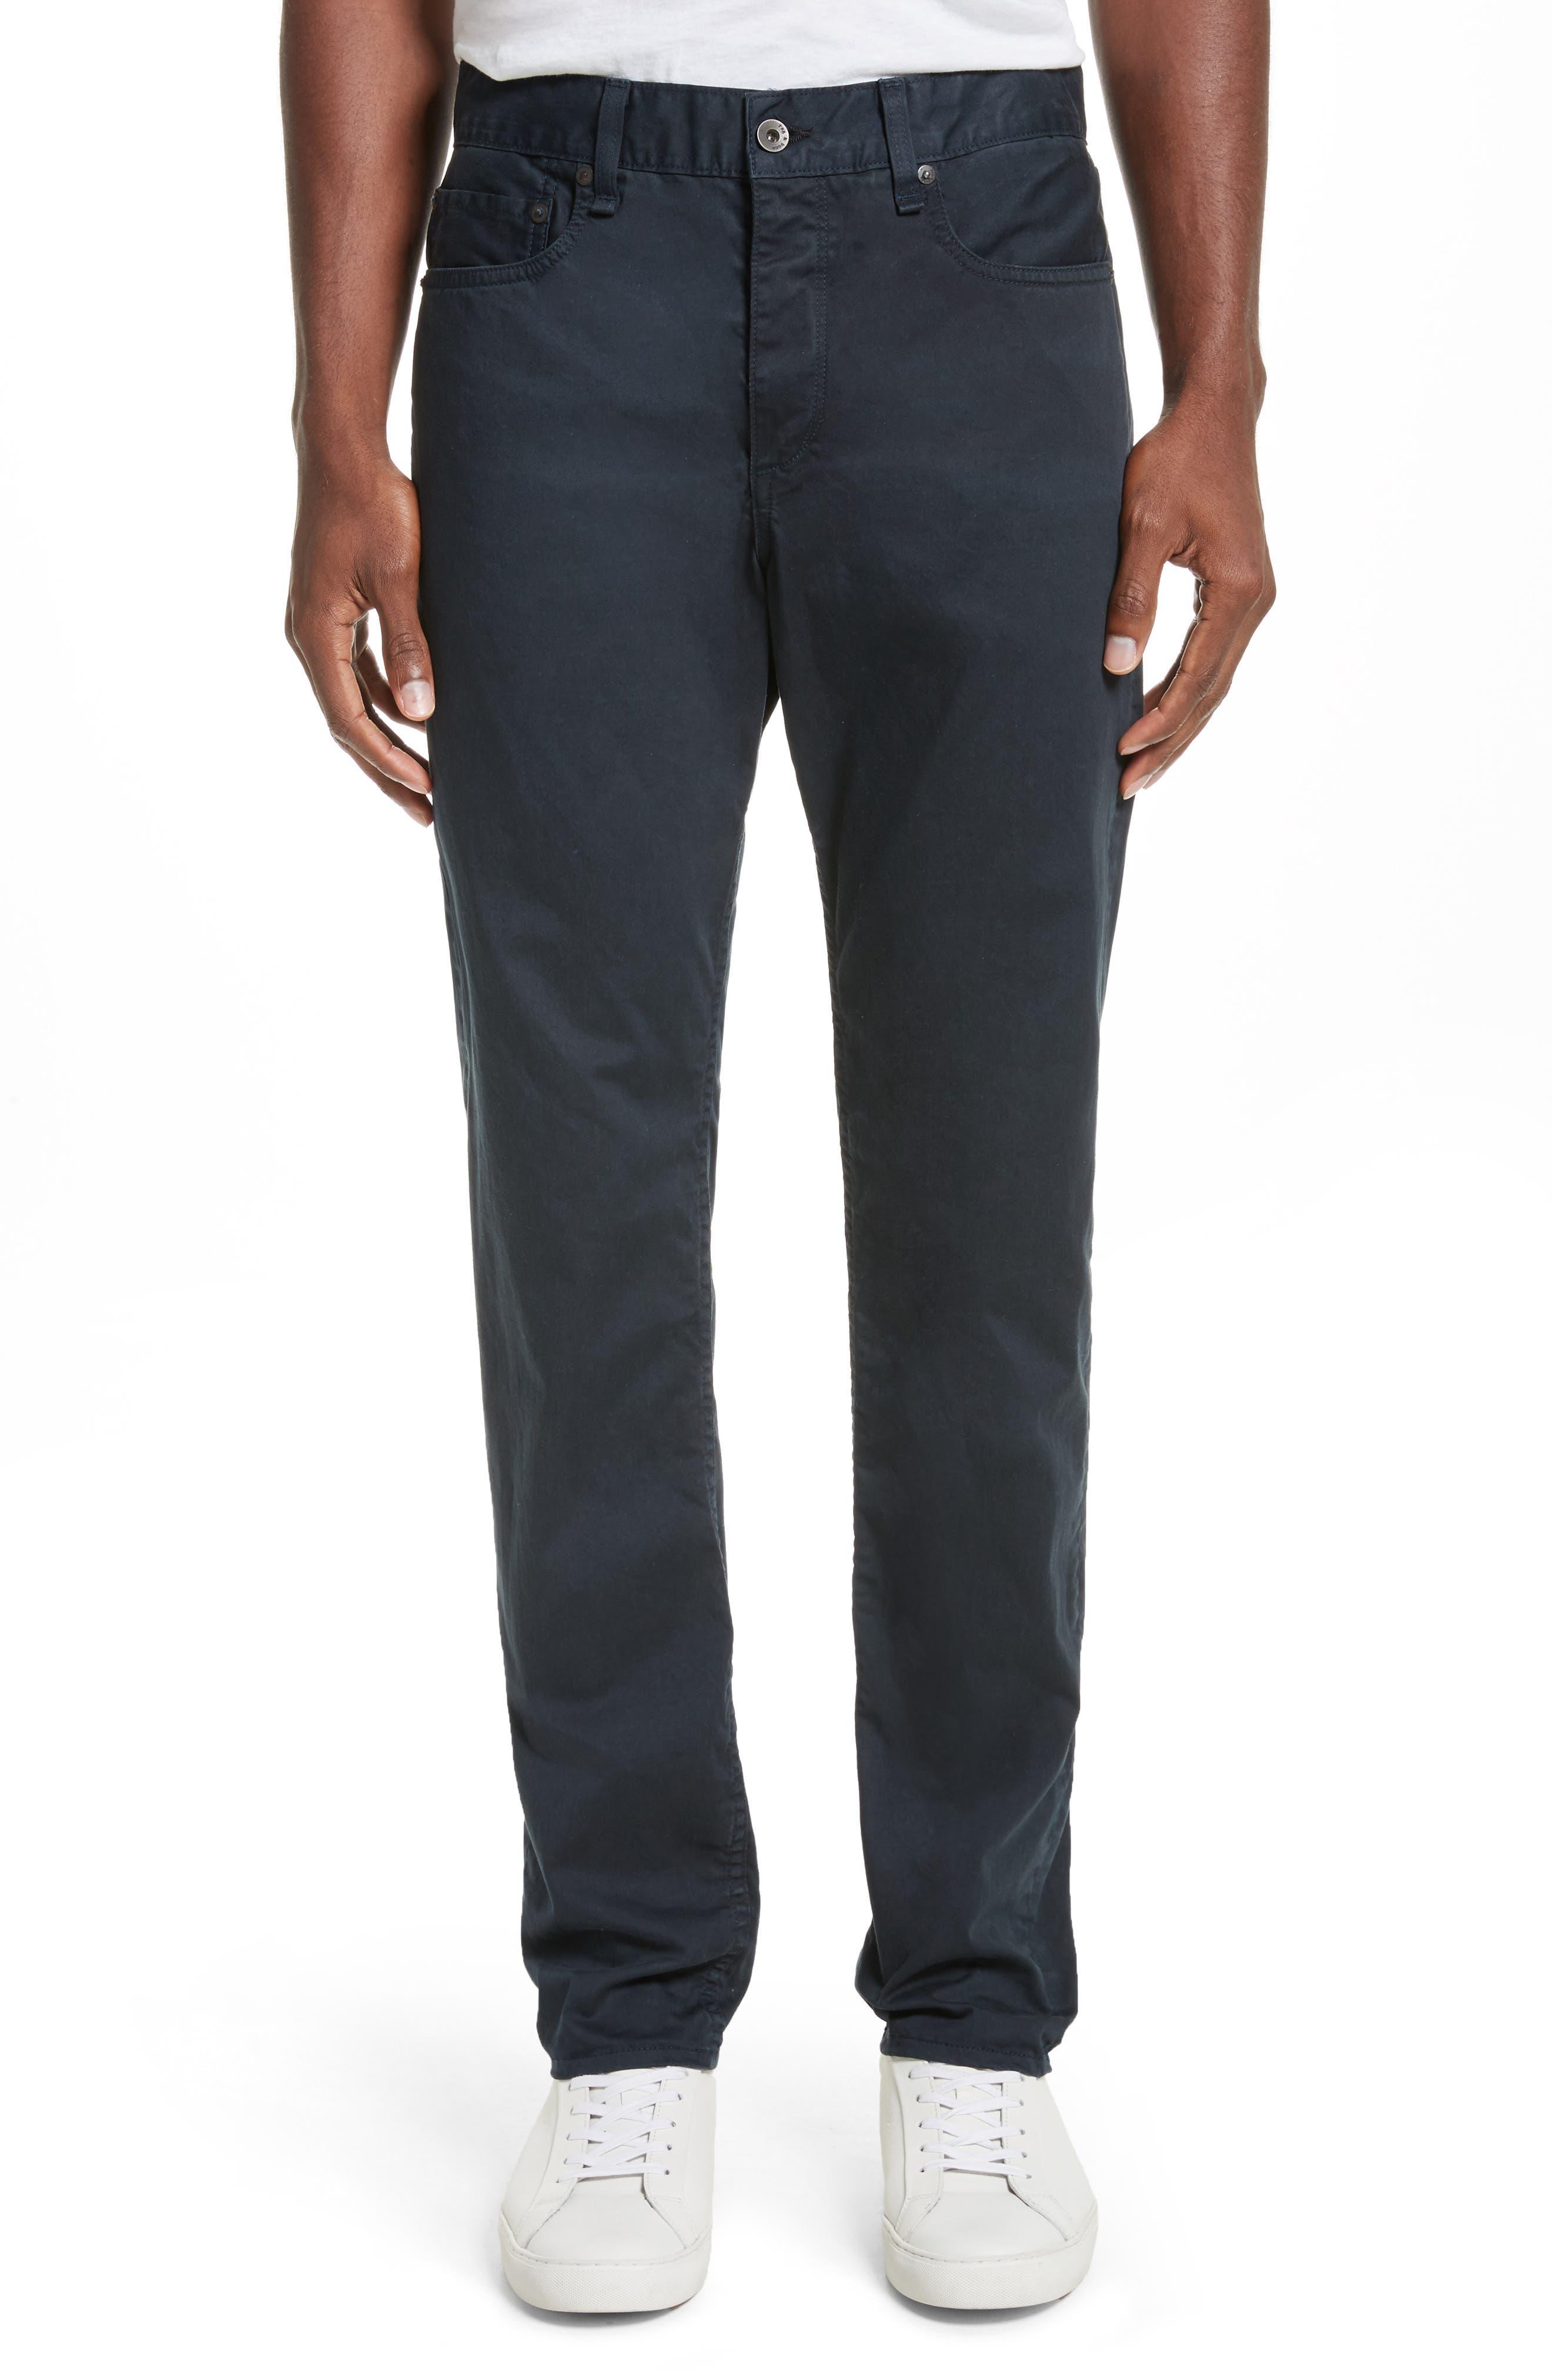 Alternate Image 1 Selected - rag & bone Fit 3 Twill Pants